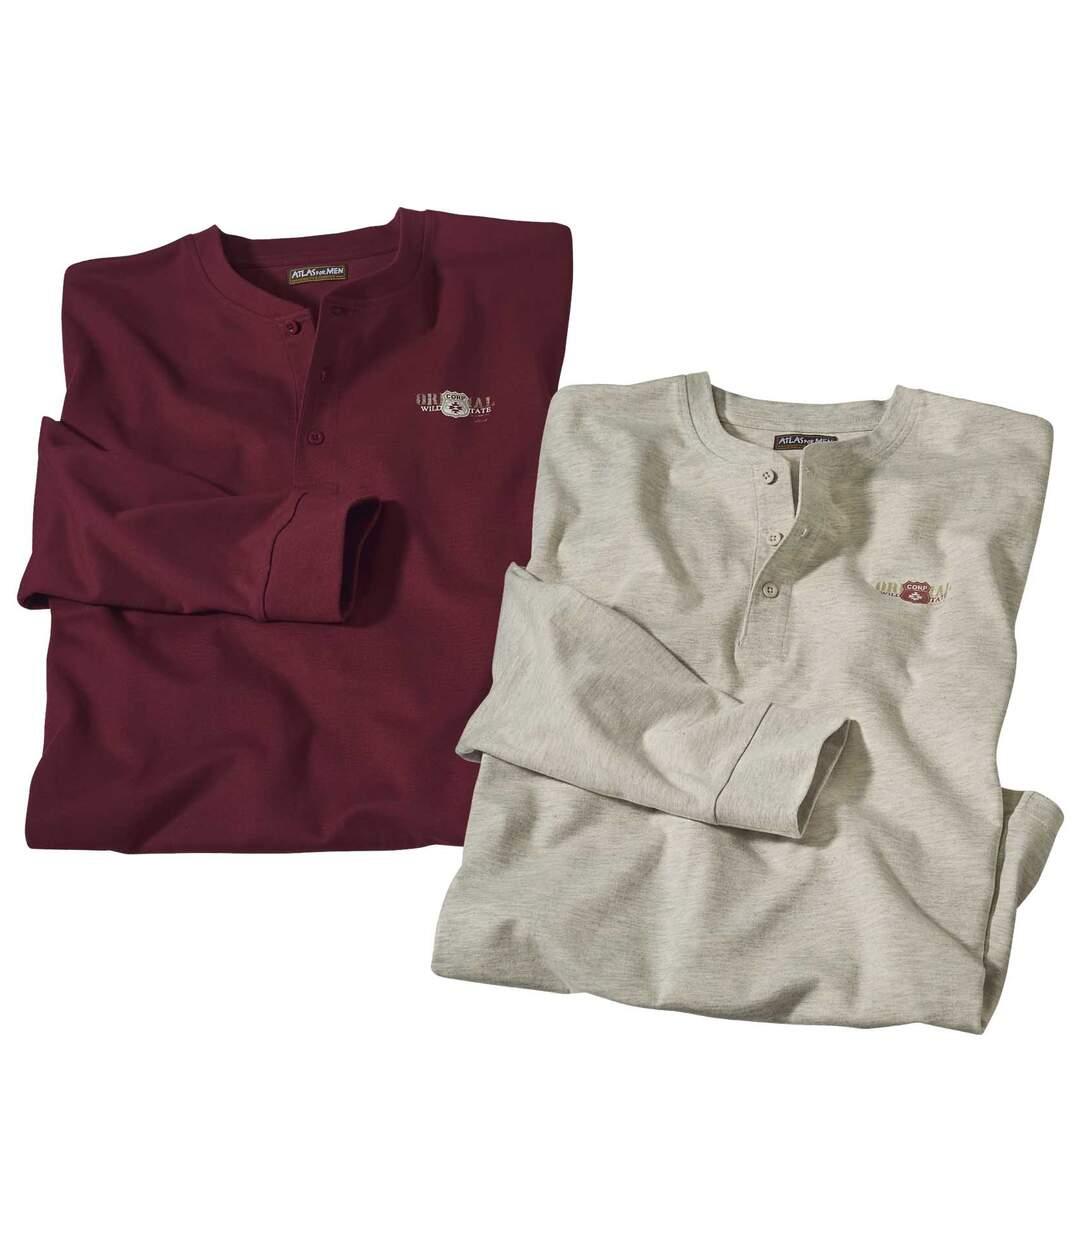 Zestaw 2 t-shirtów Original Corp